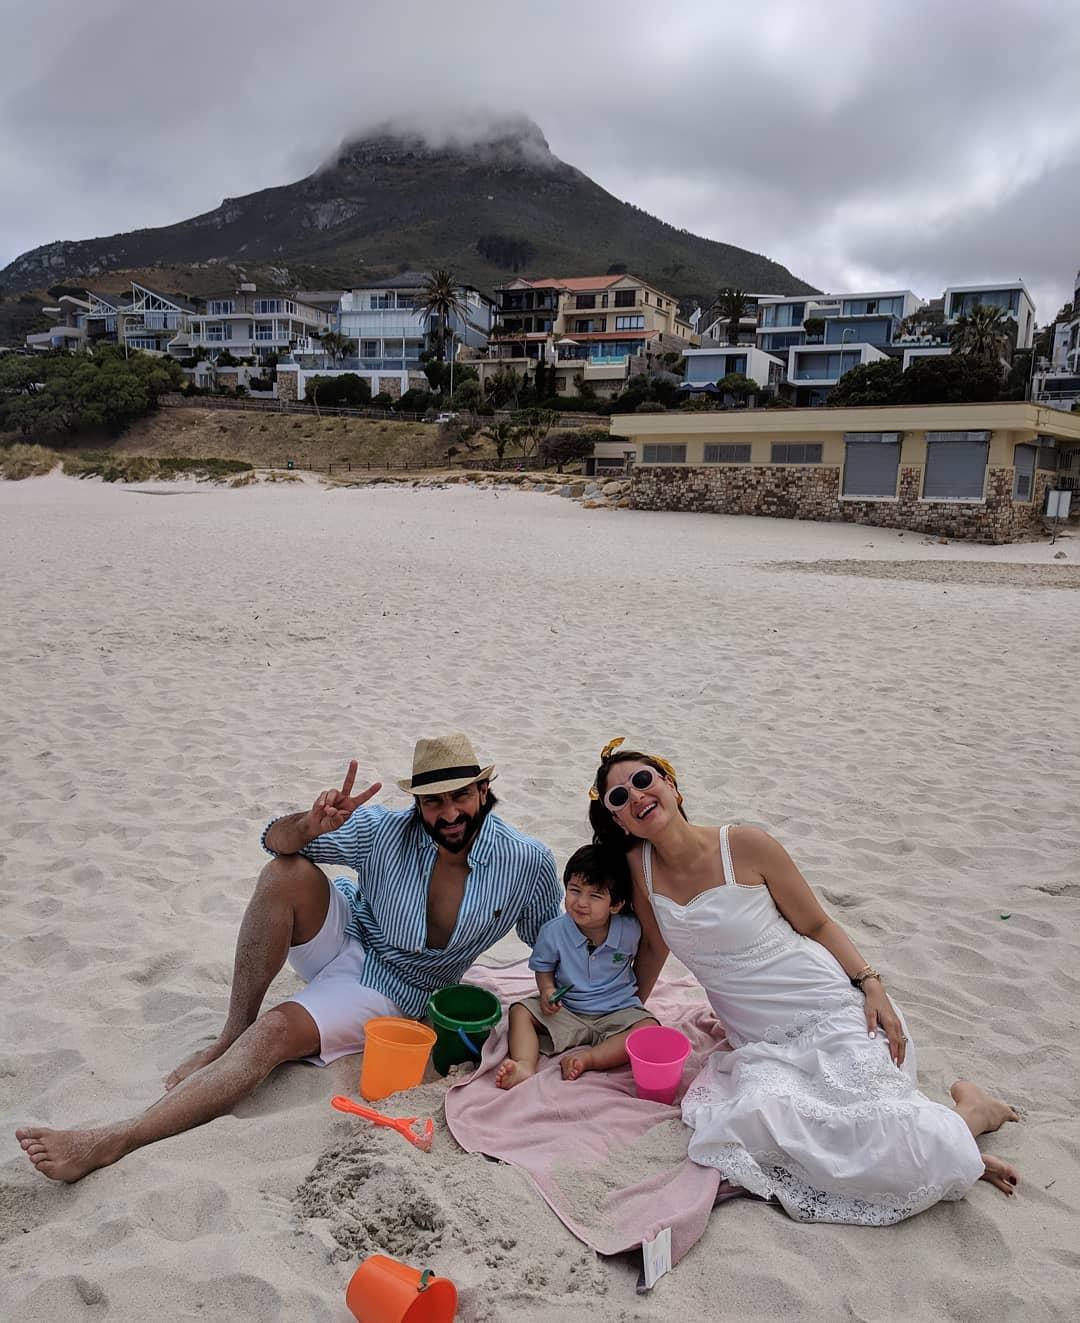 Saif Ali Khan, Kareena and Their Son Taimoor Ali Khan Having Fun in South Africa